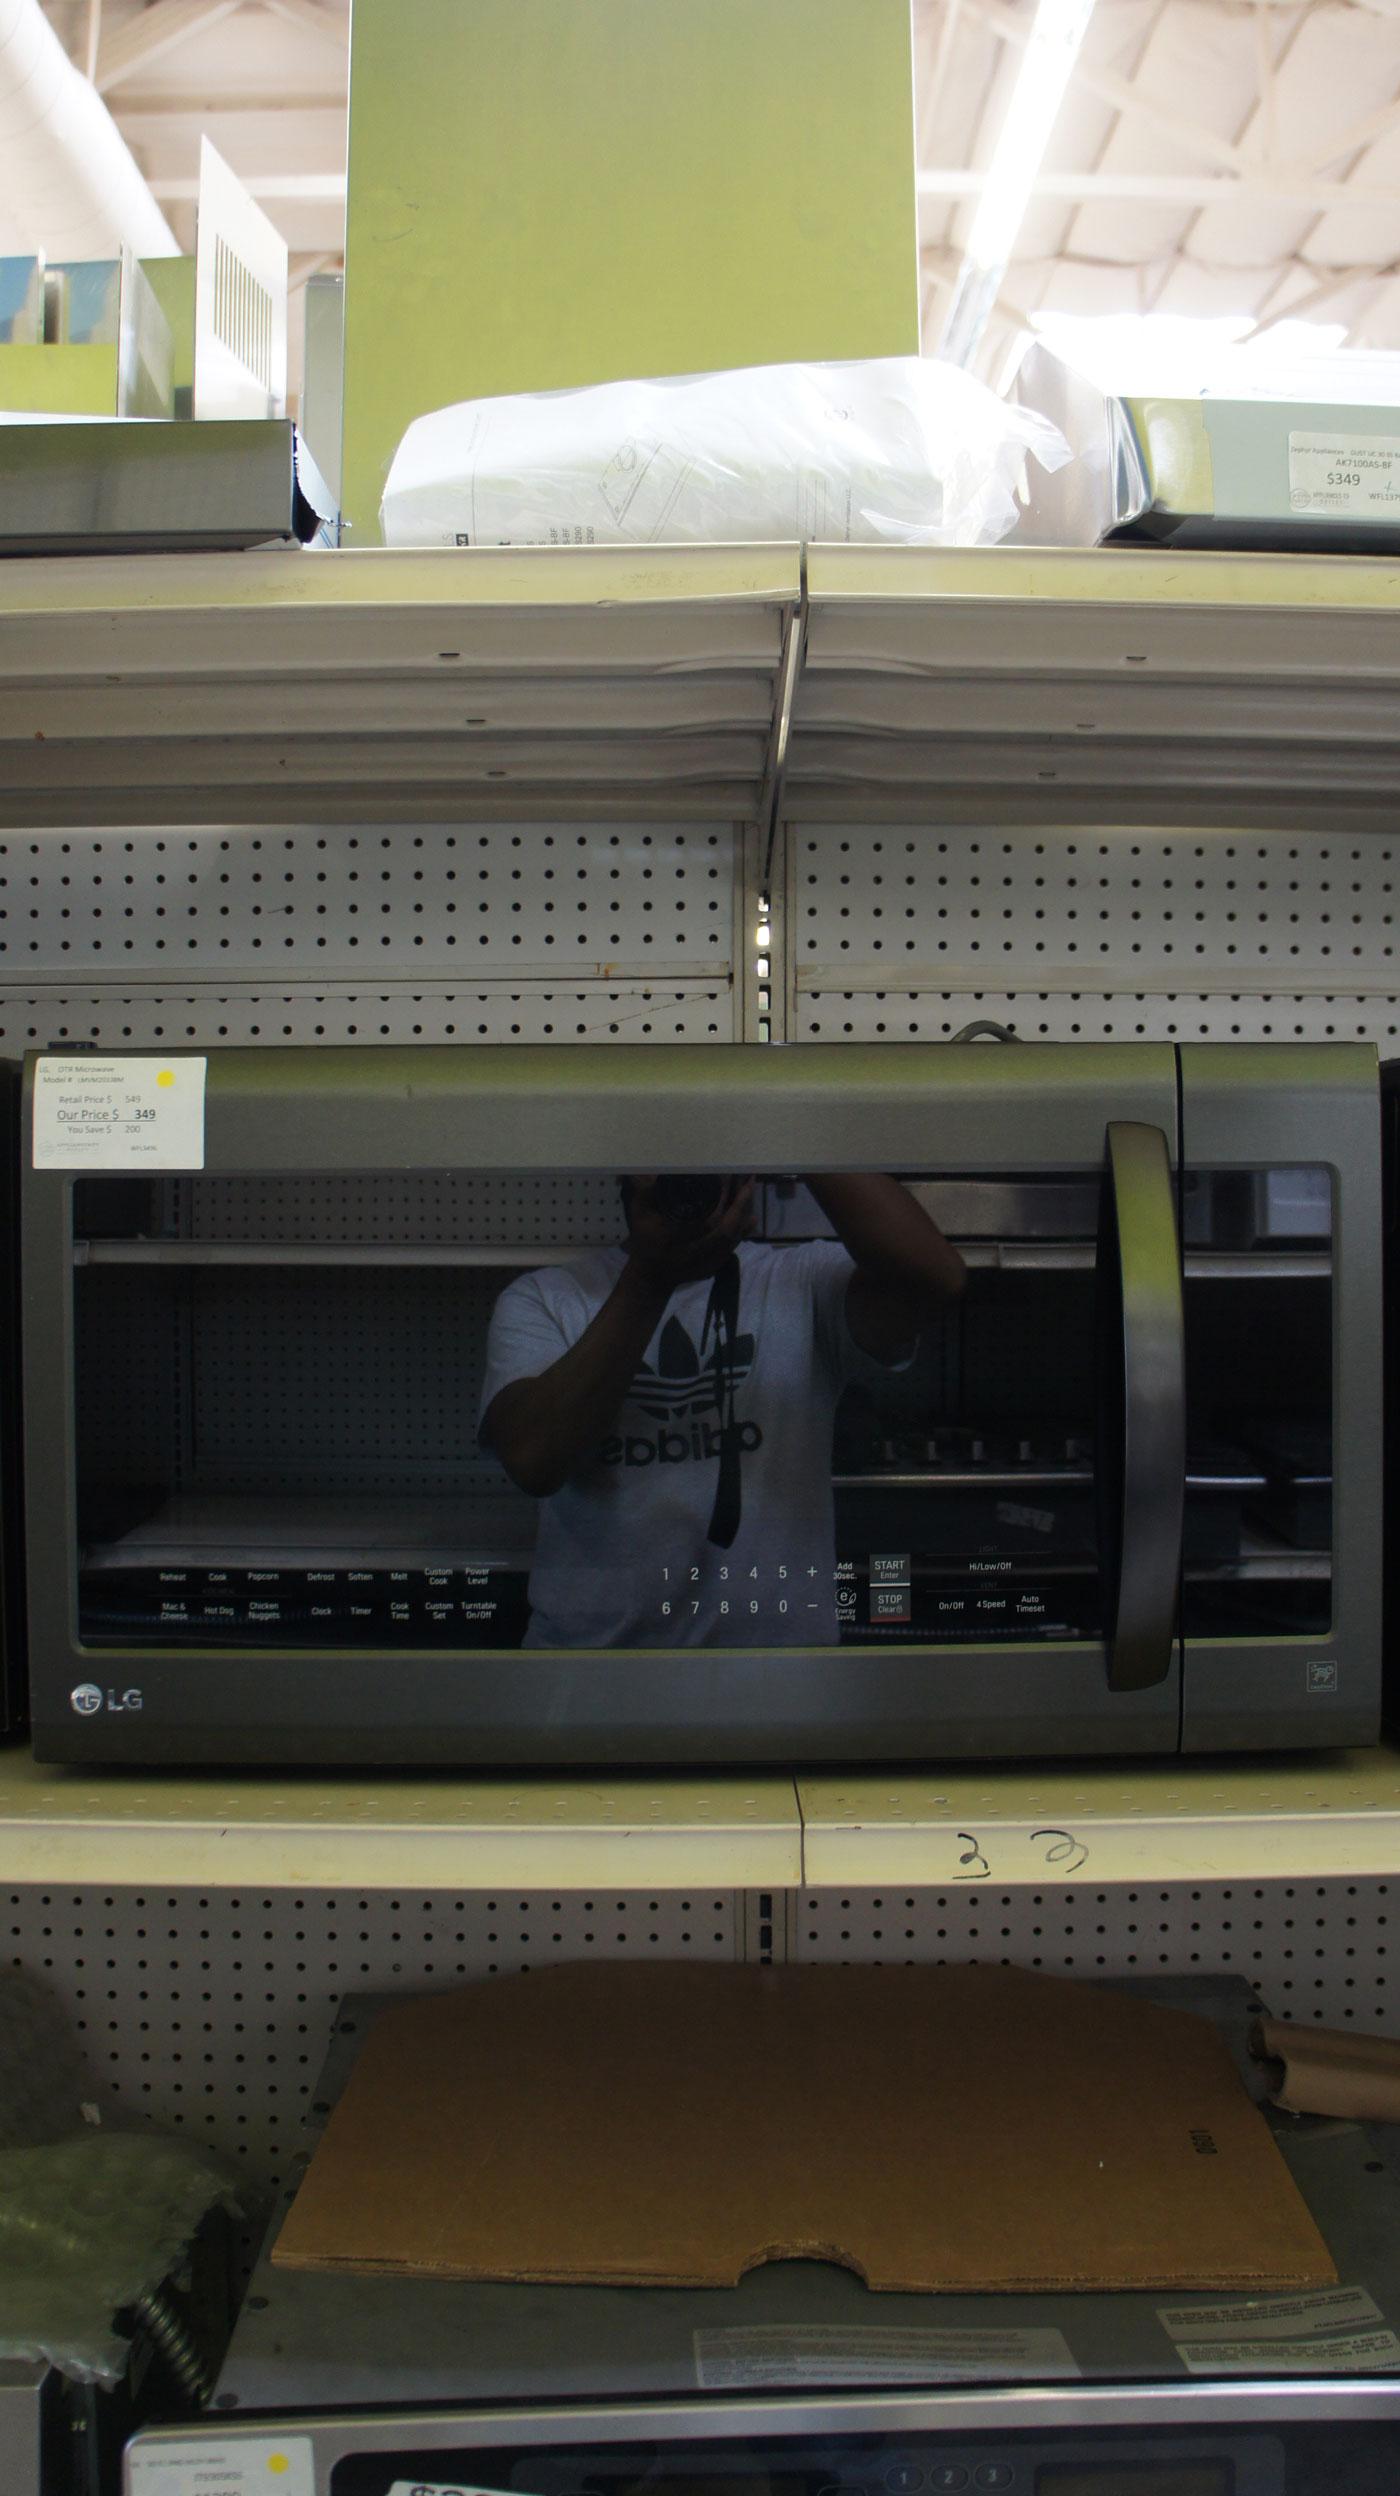 2.0 cu.ft. LG LMVM2033BM Over-The-Range Microwave Oven